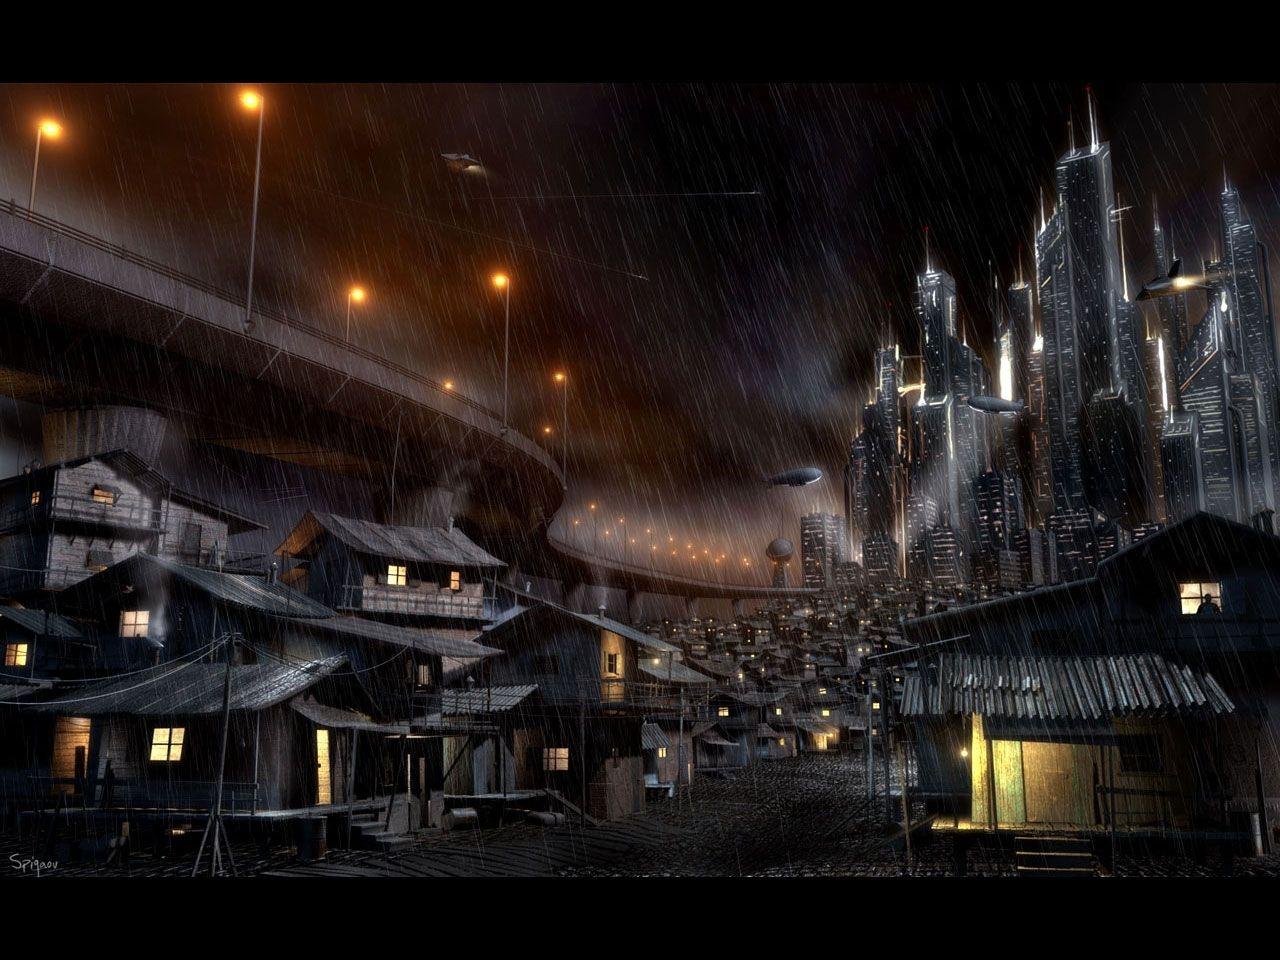 Dark Future City Animation Wallpaper 1280x960